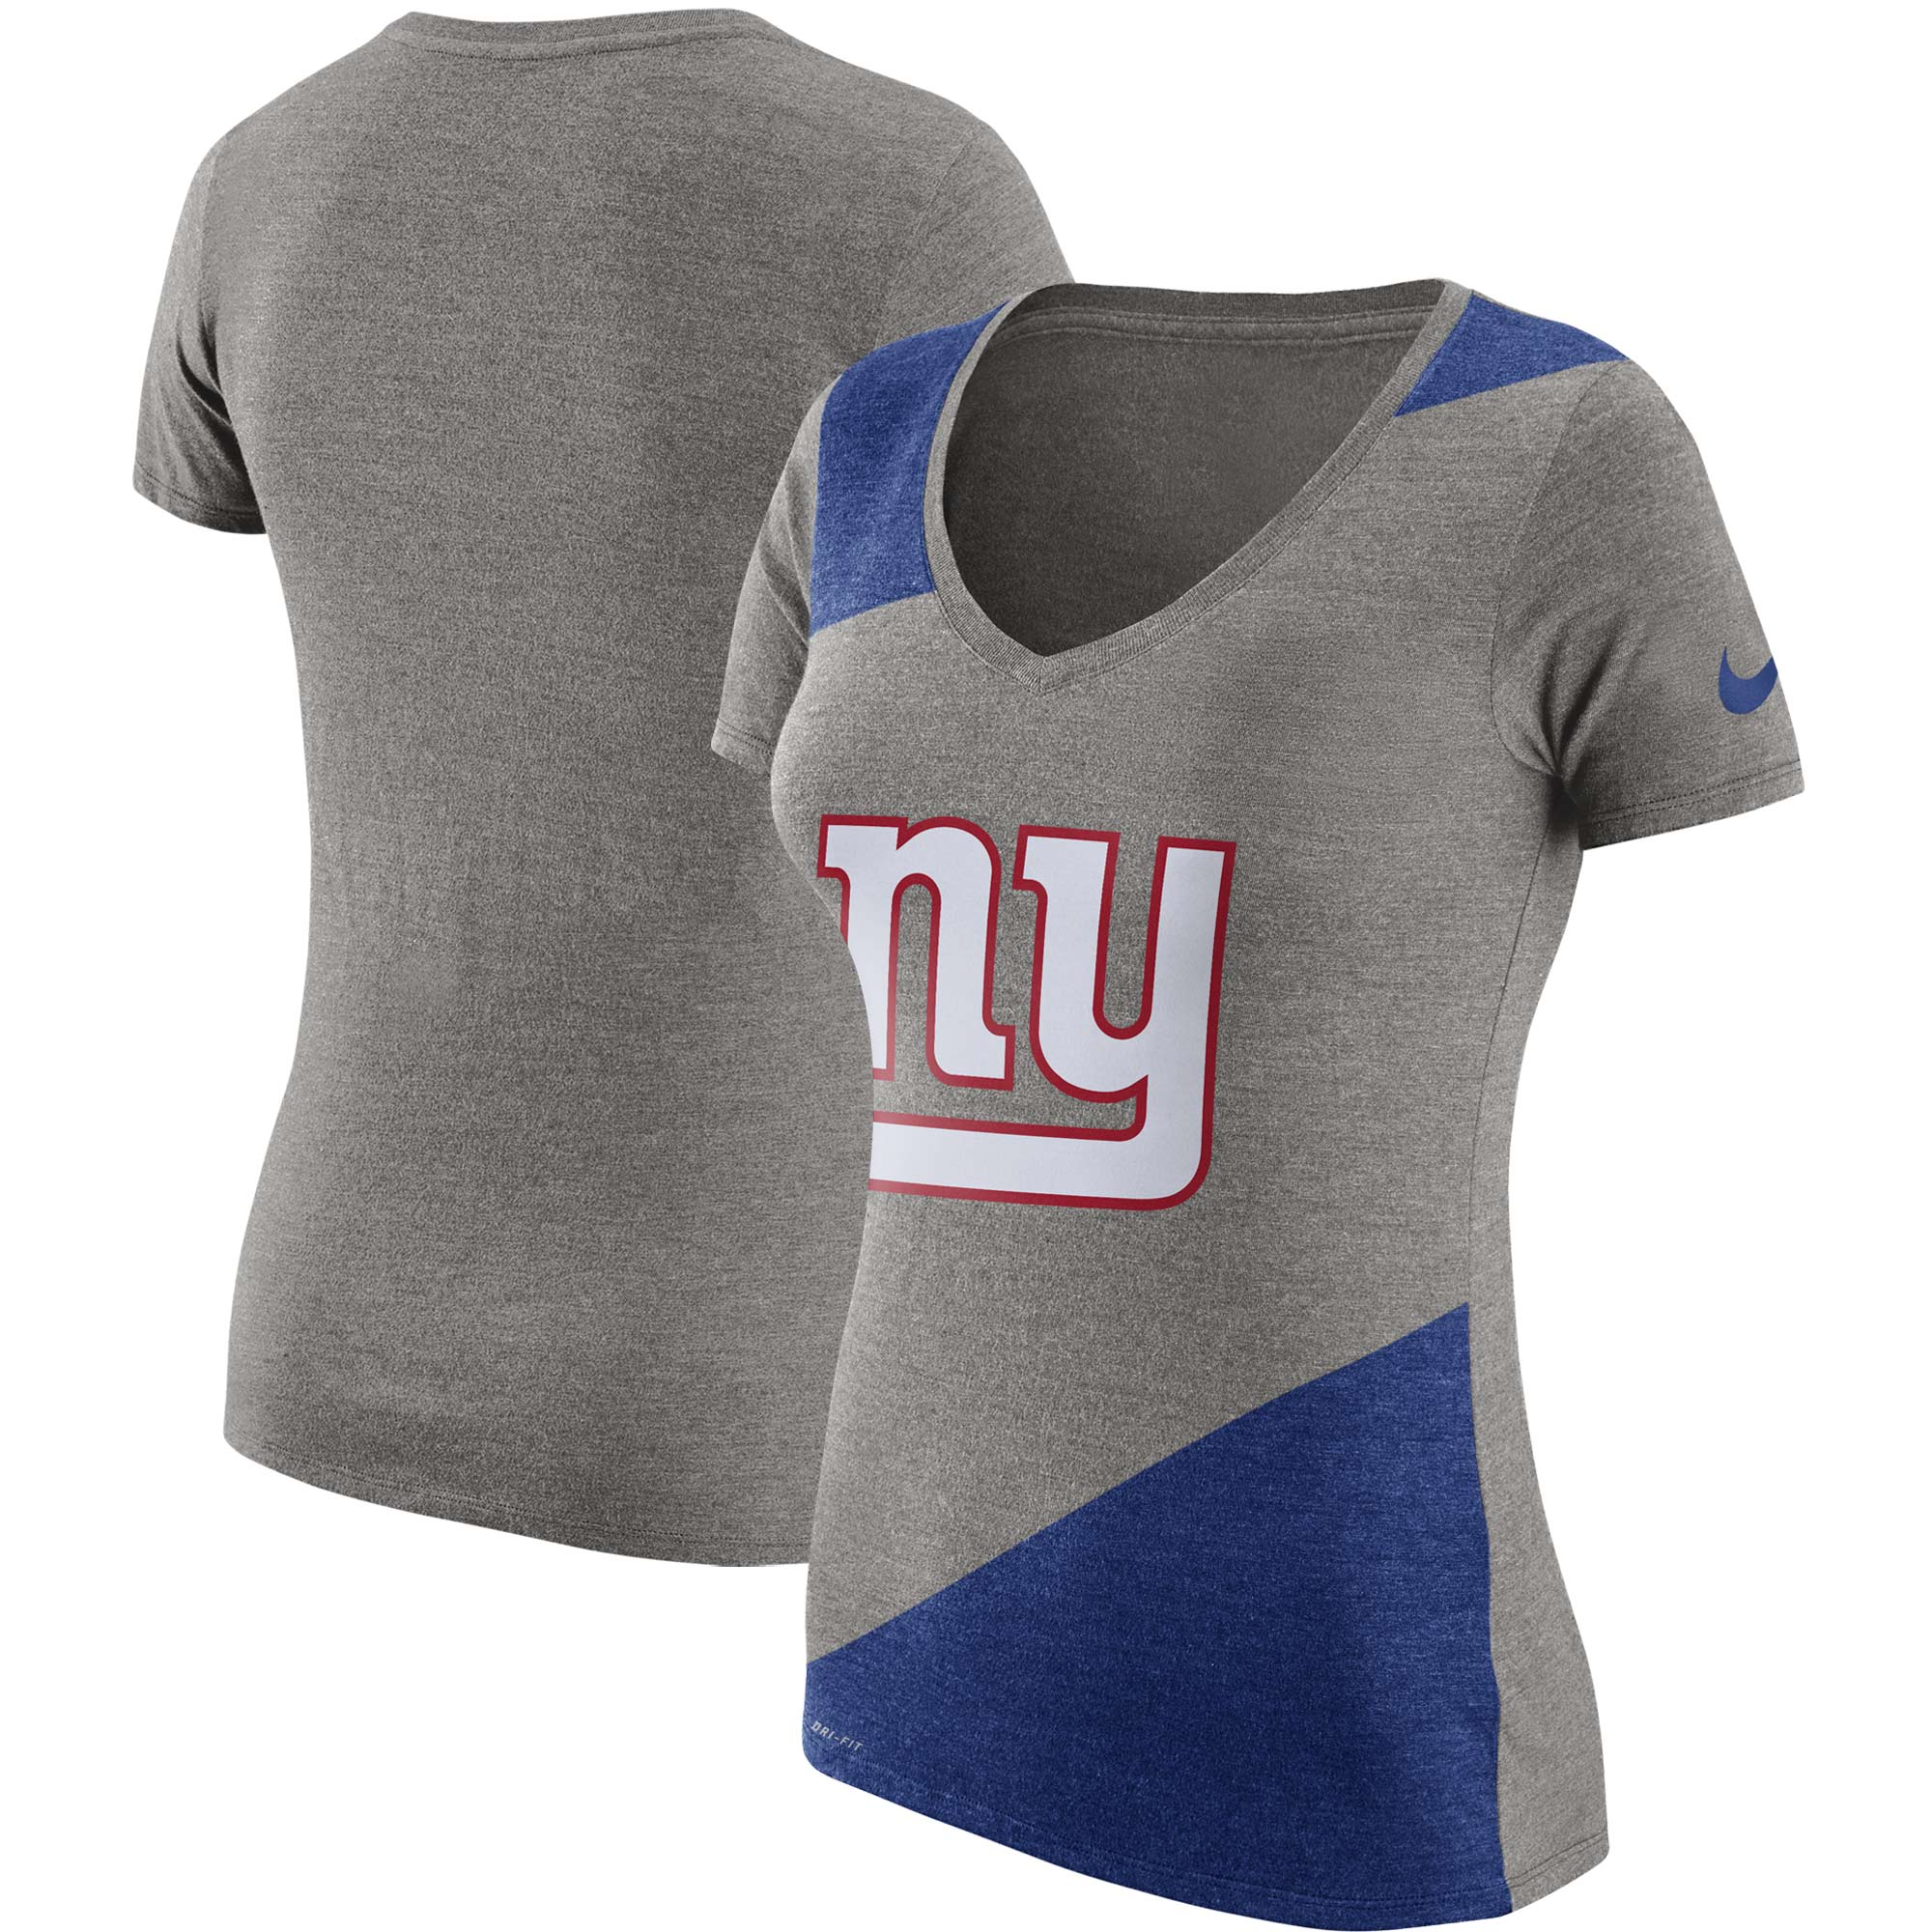 New York Giants Nike Women's Performance V-Neck T-Shirt - Heathered Gray